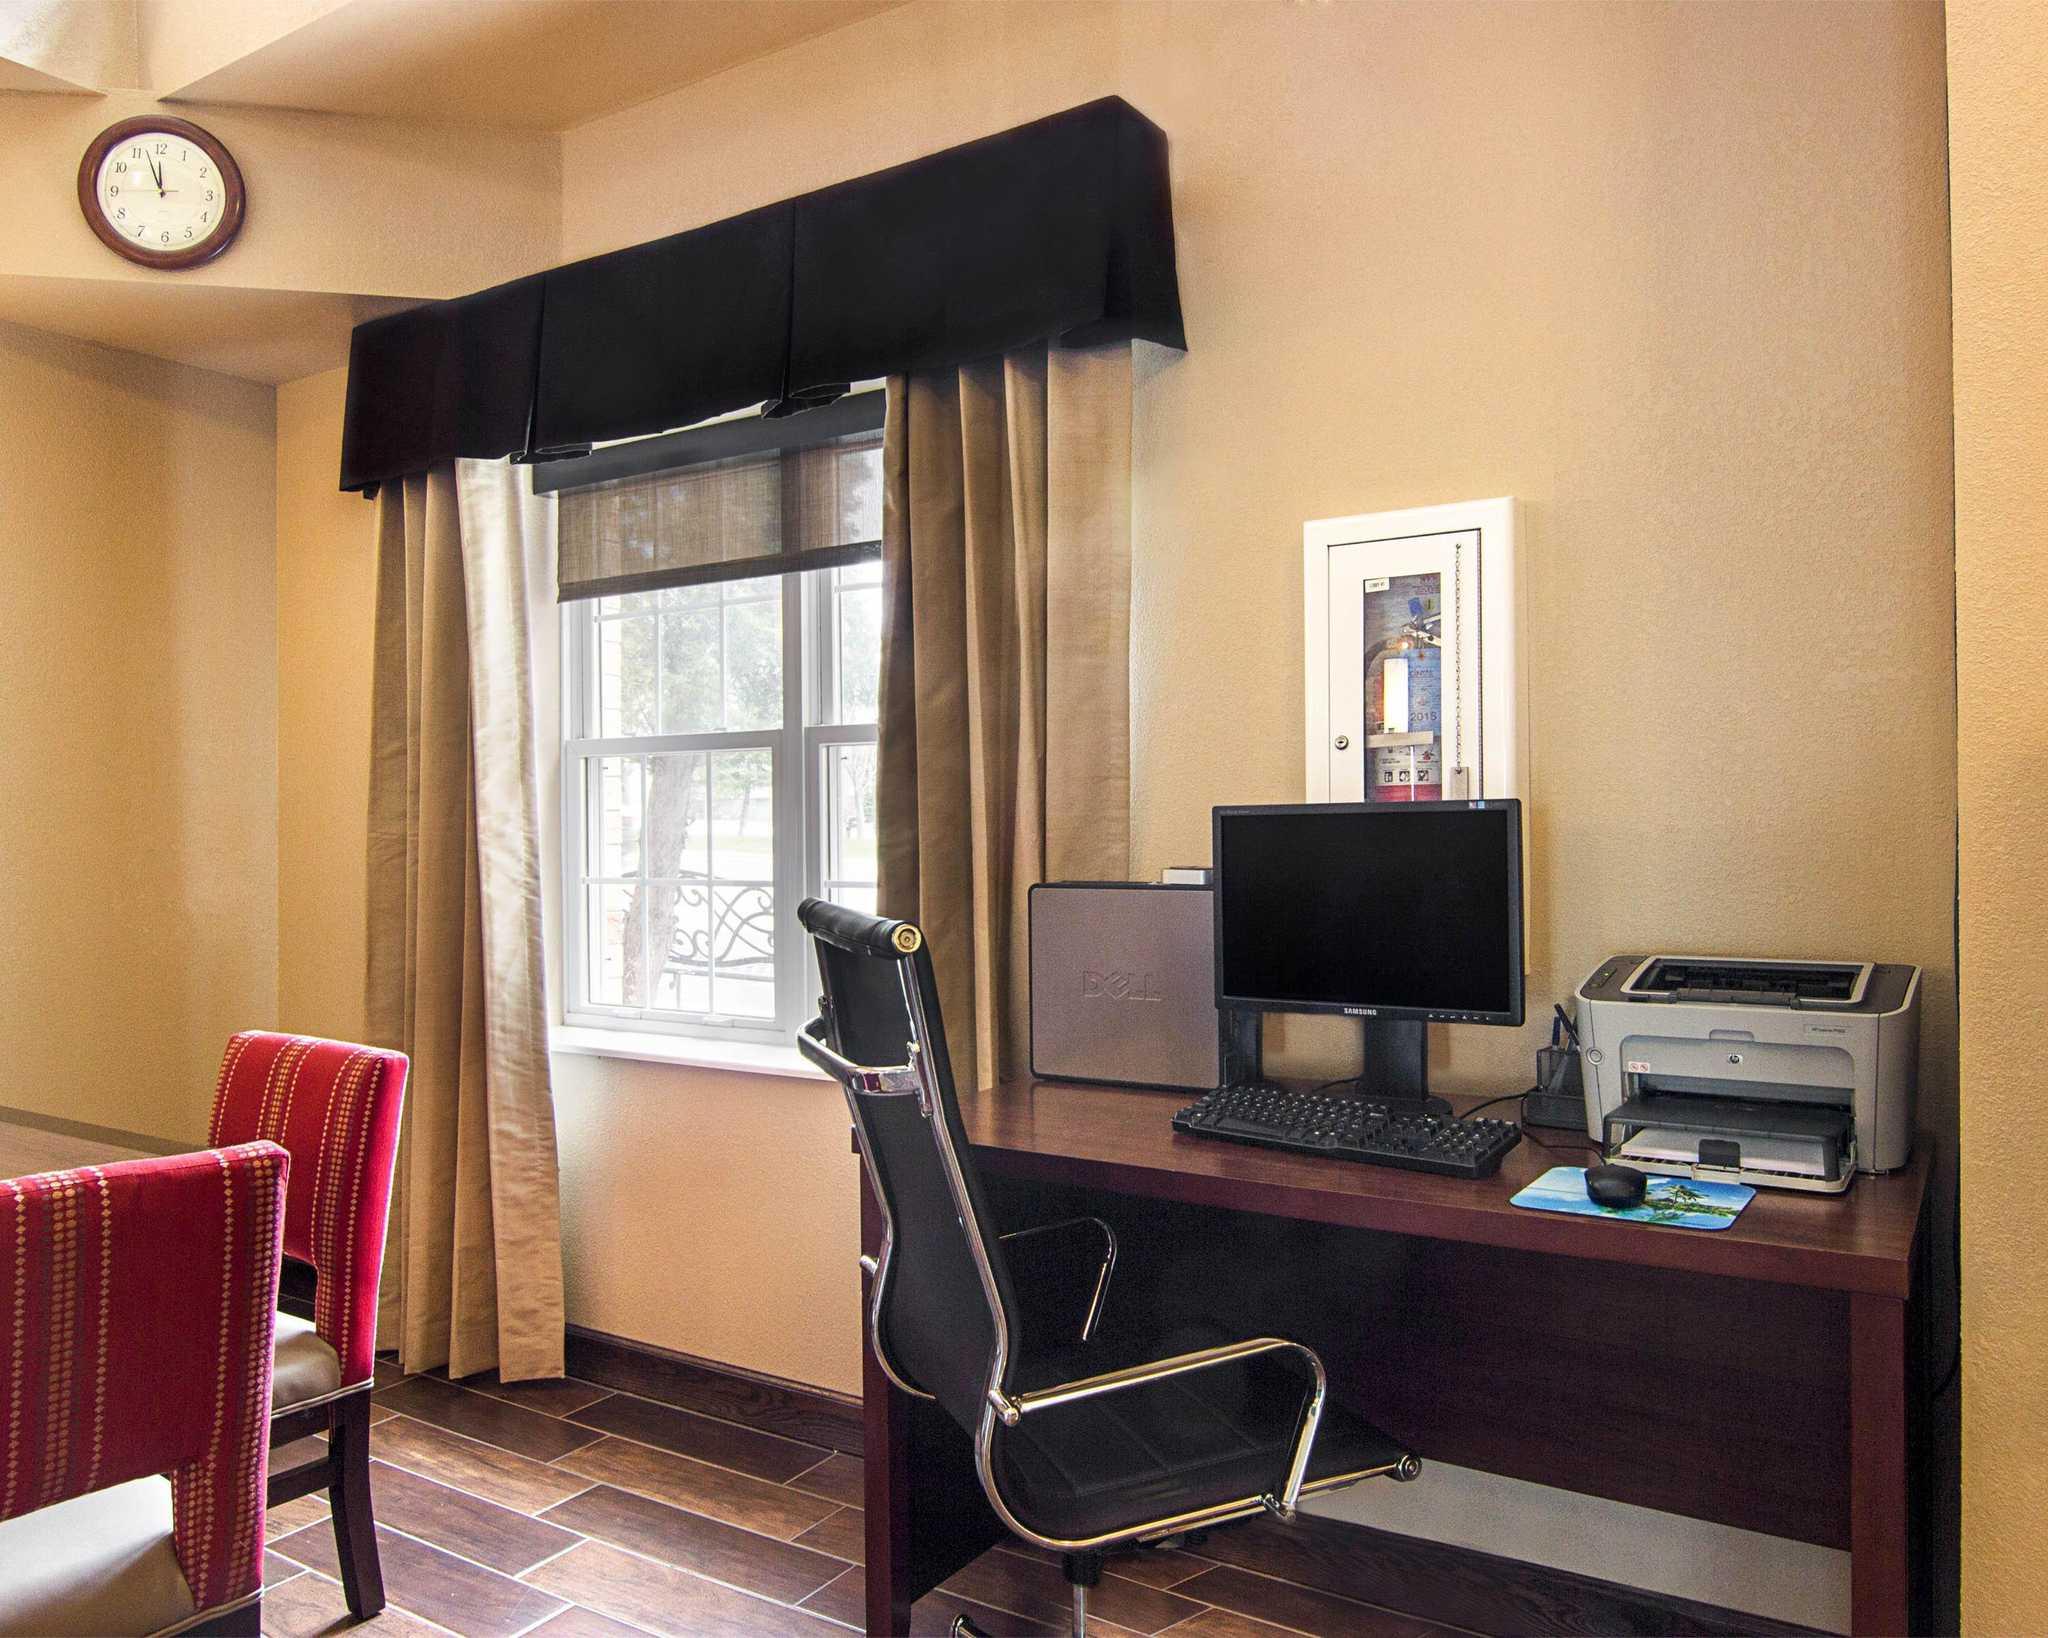 Comfort Inn Amp Suites Coupons Grafton Wi Near Me 8coupons